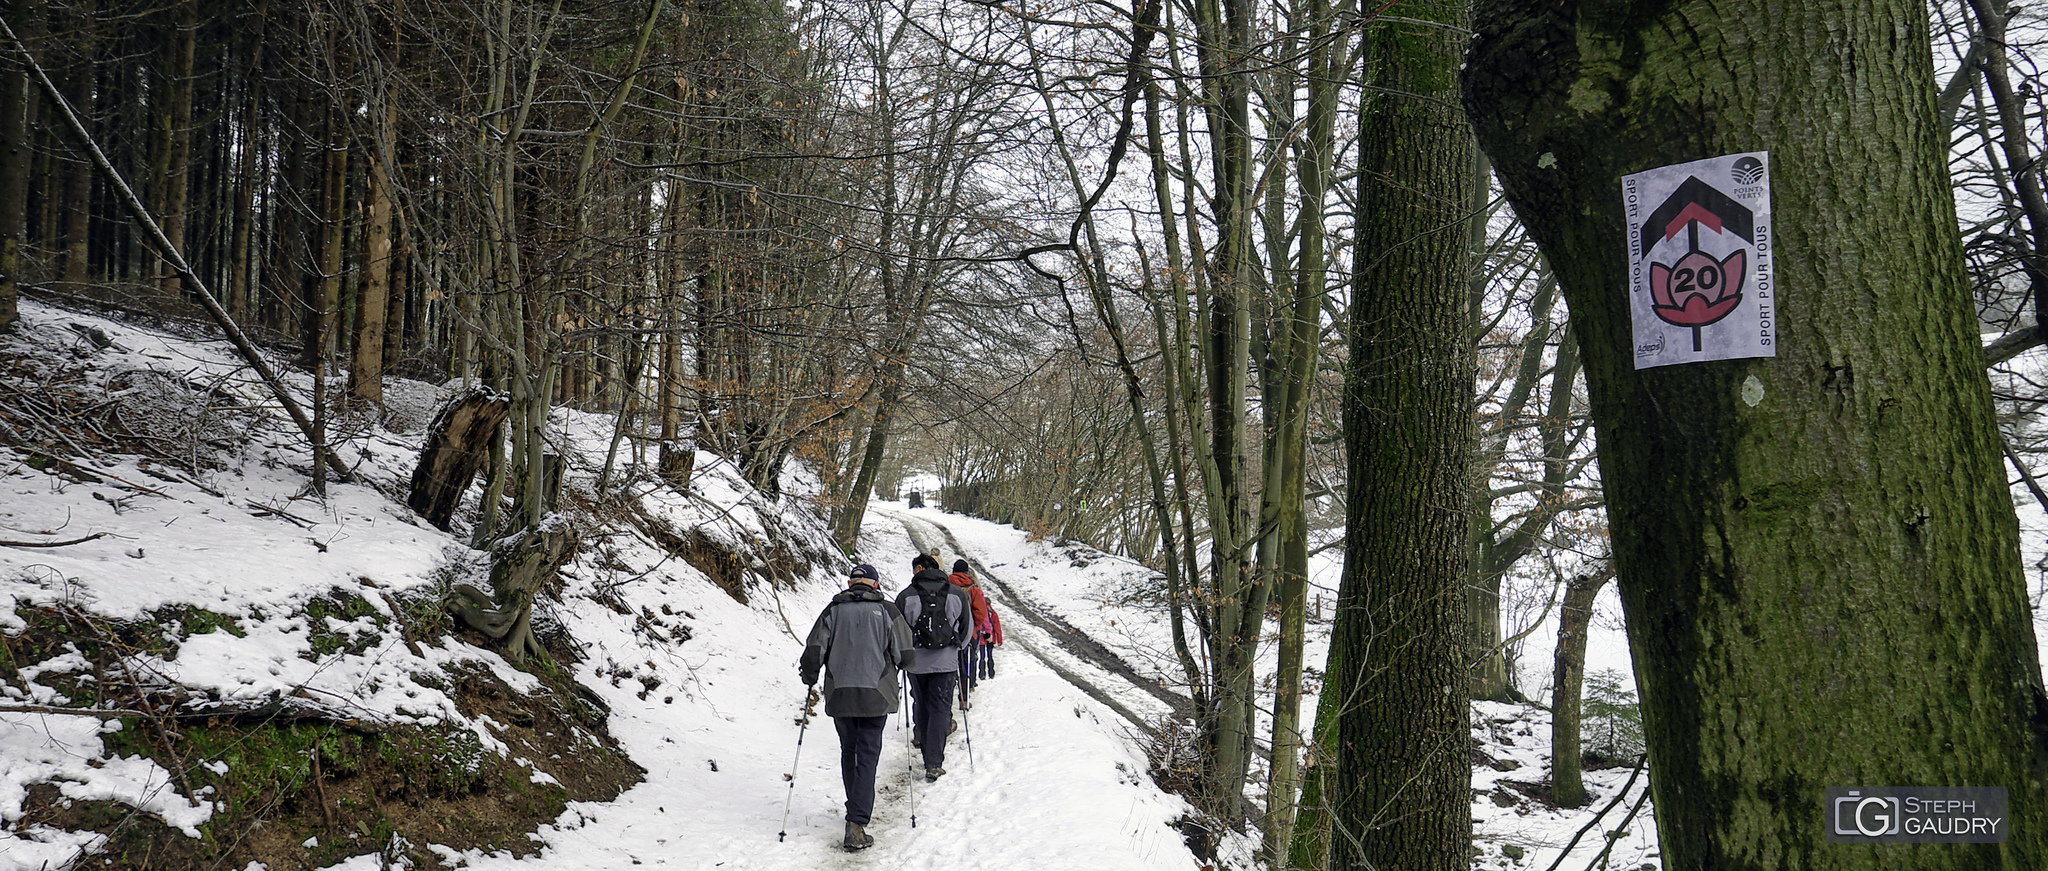 Marche ADEPS 2019_02_03_132047 [Click to start slideshow]